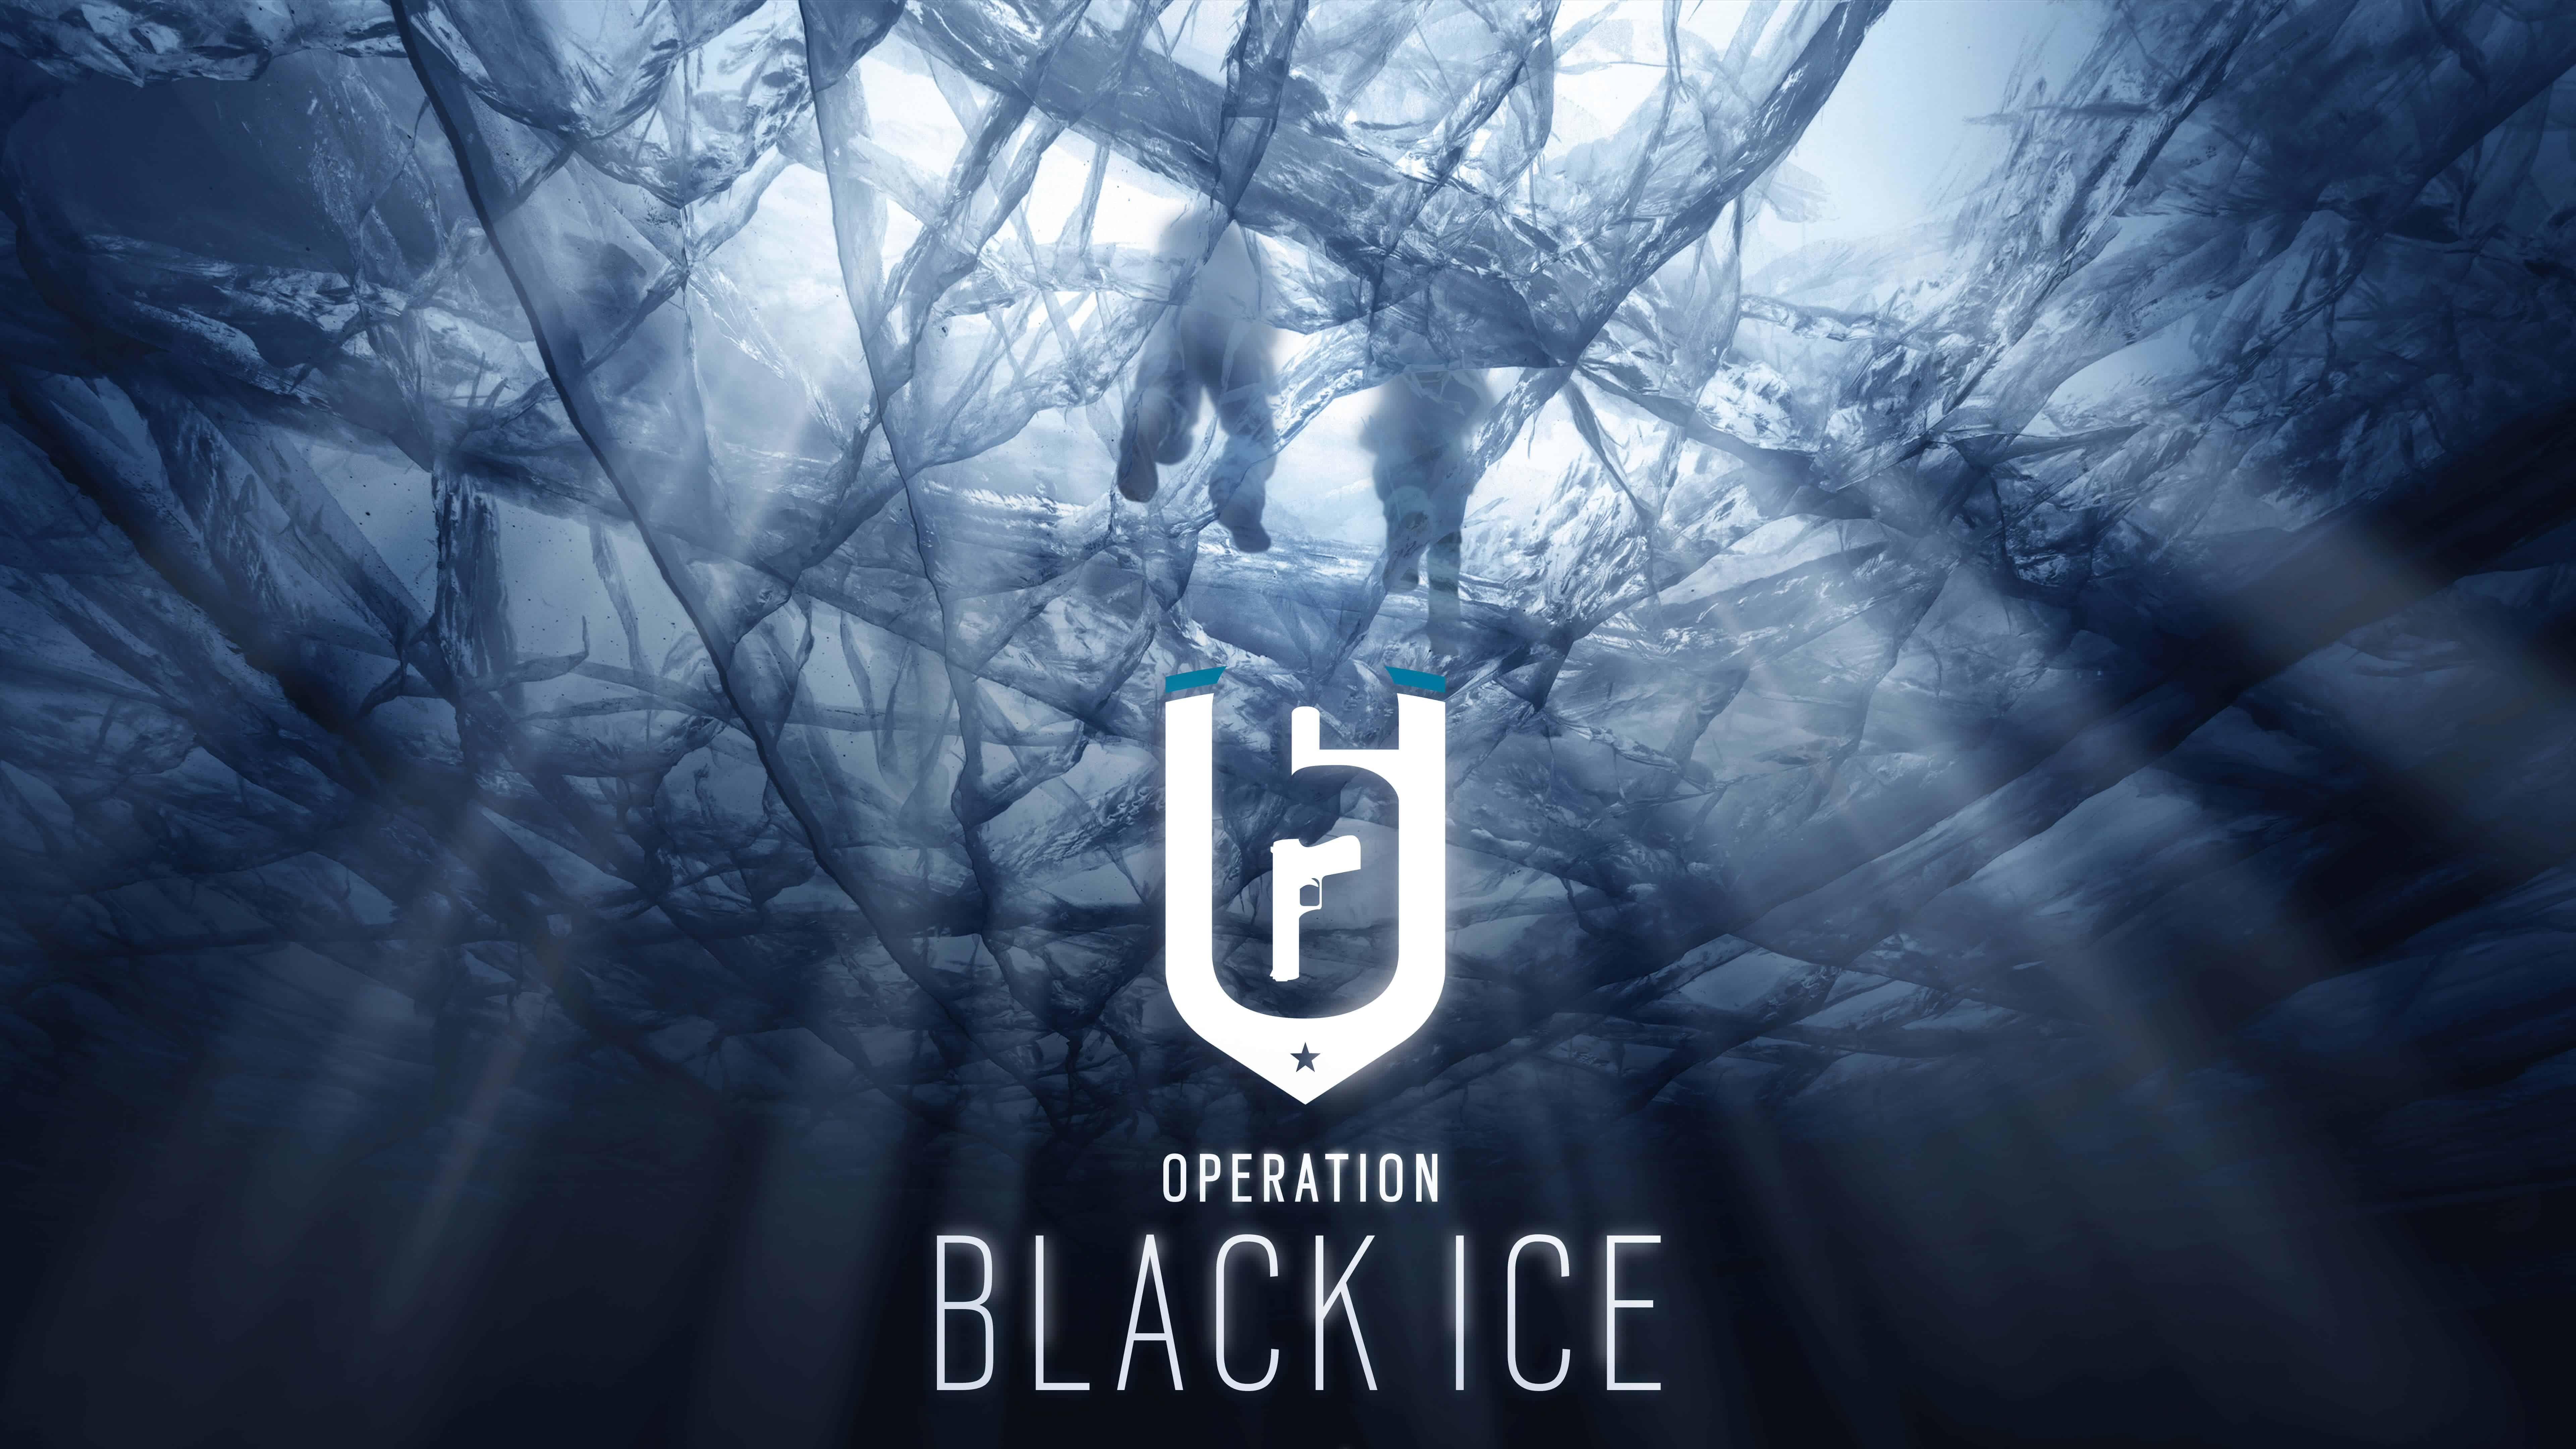 Rainbow Six Siege Operation Black Ice UHD 8K Wallpaper